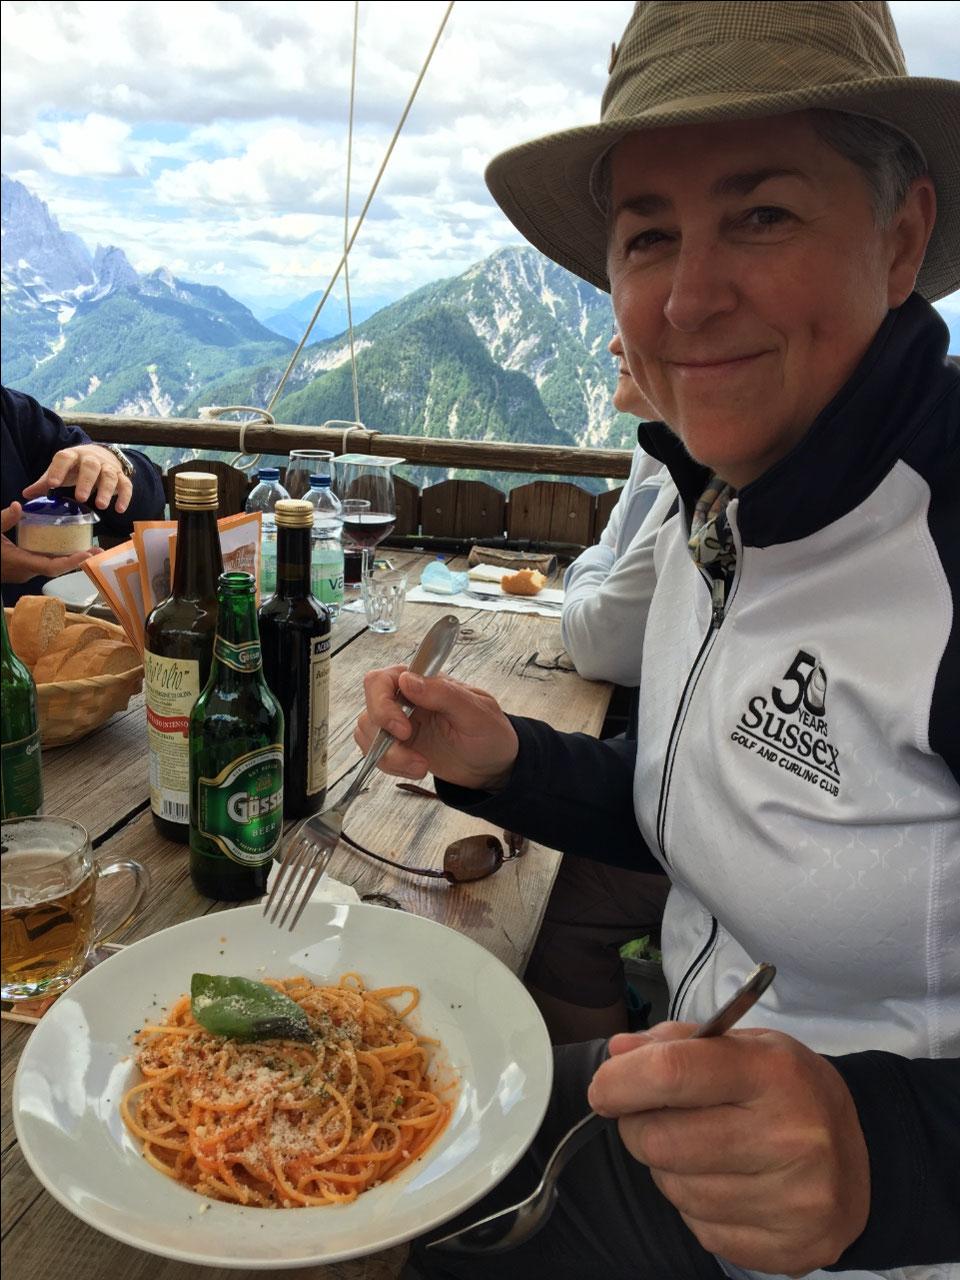 It's Italy!  Spaghetti of course!  Mangia!